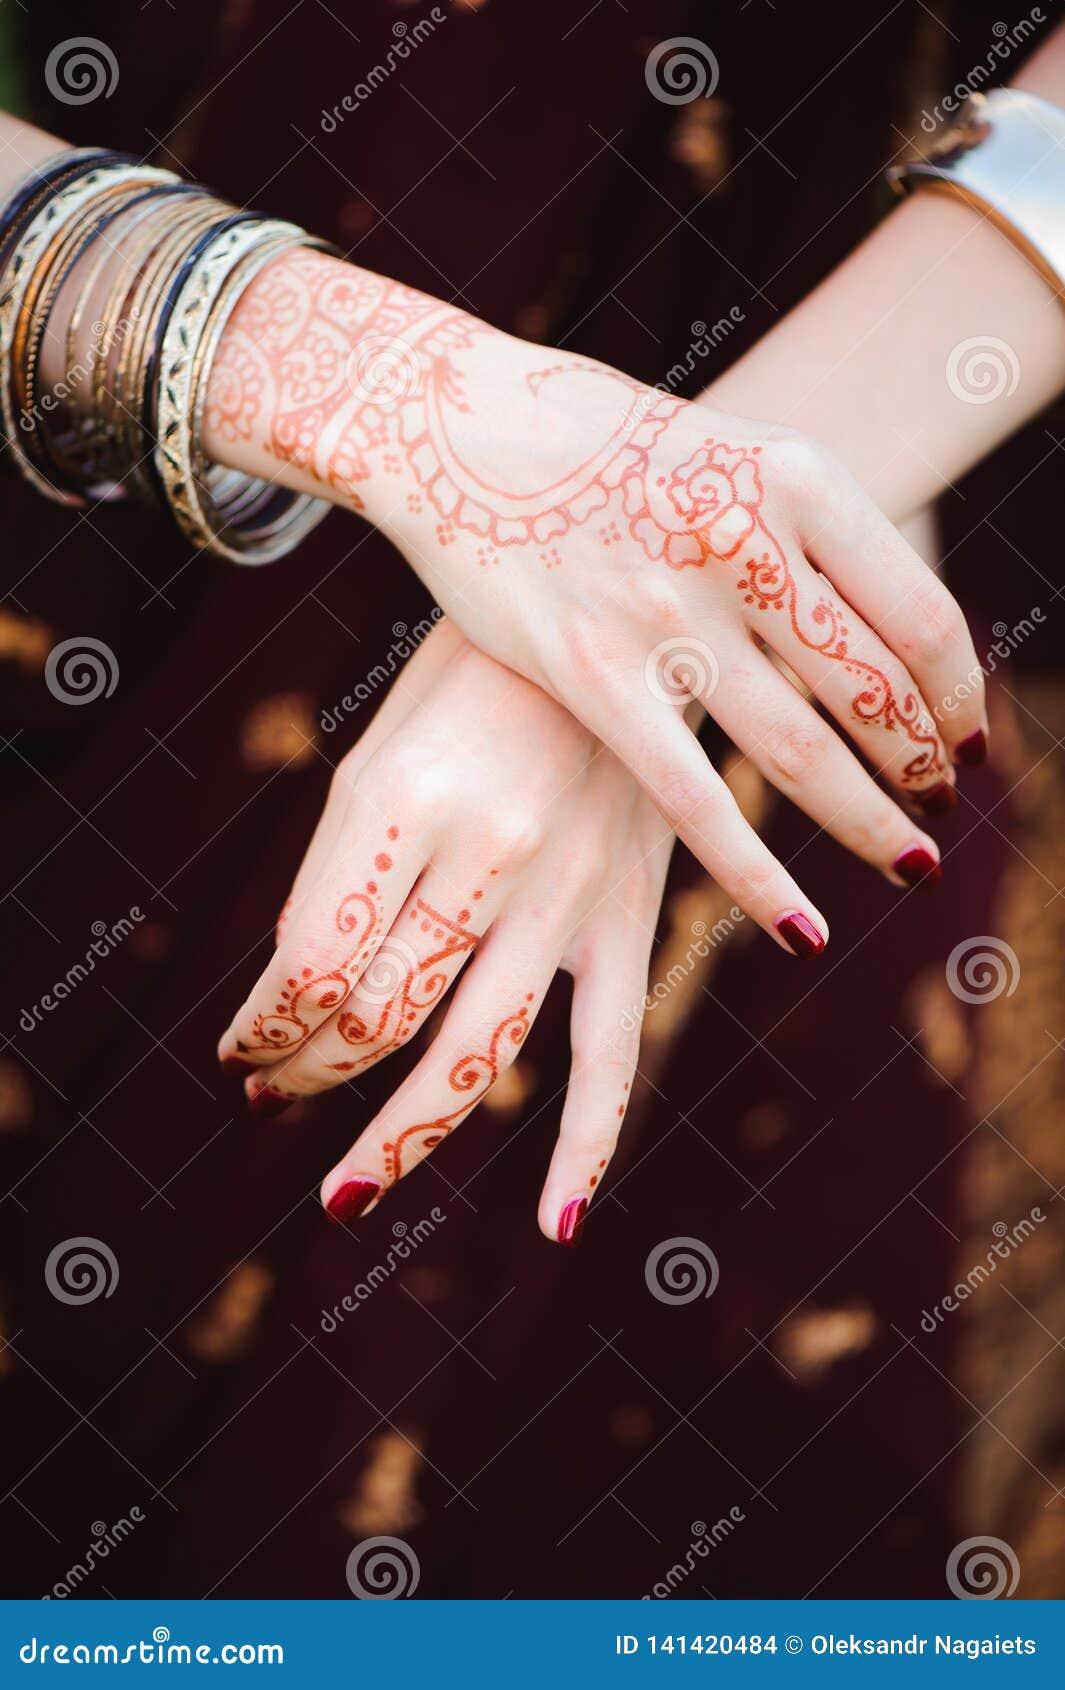 Mehndi Tattoo Woman Hands With Black Henna Tattoos India National